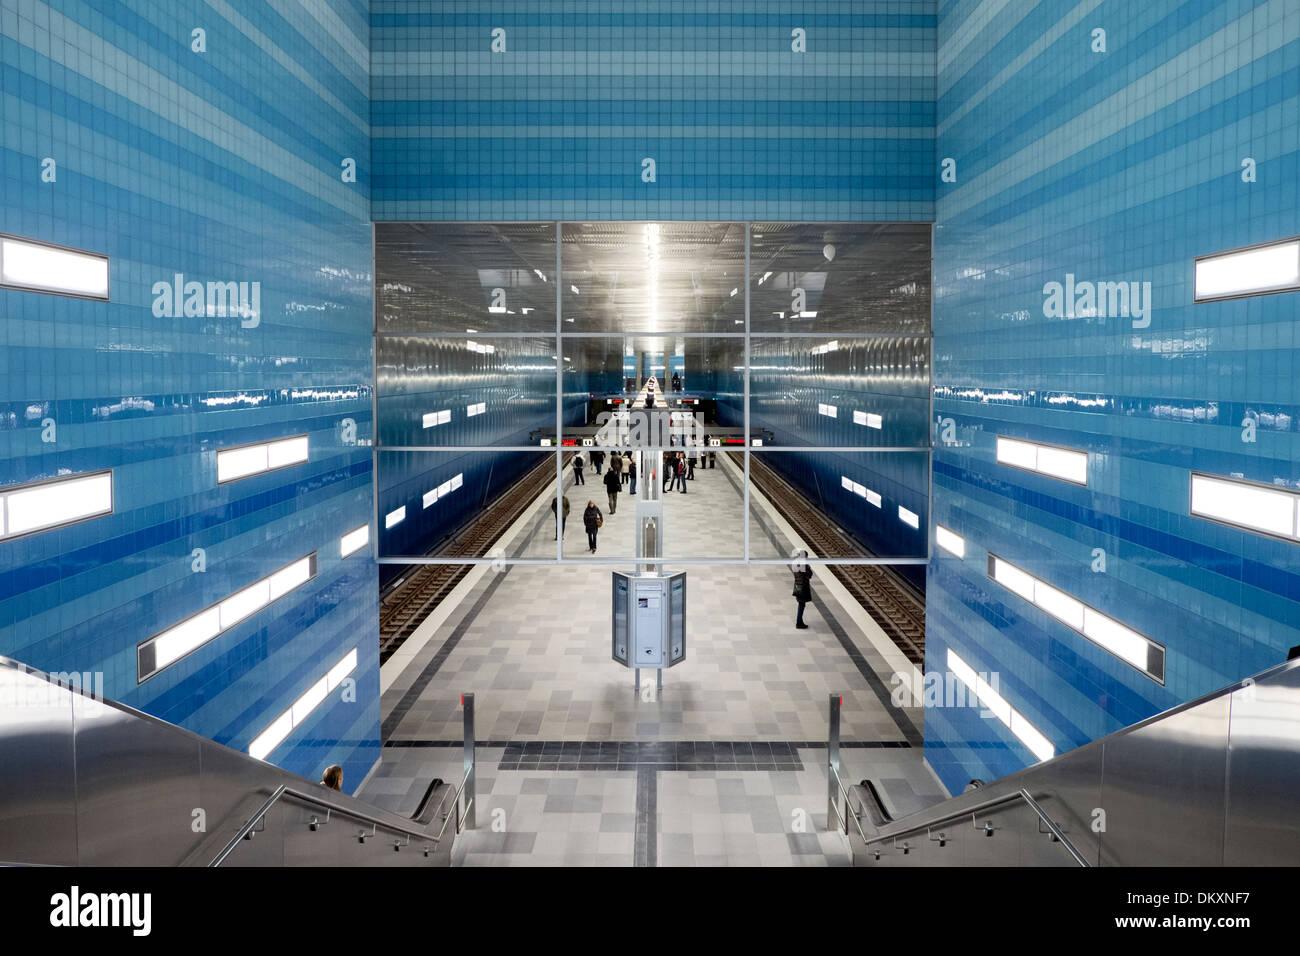 U4 rail station Überseequartier, Hamburg, Germany - Stock Image